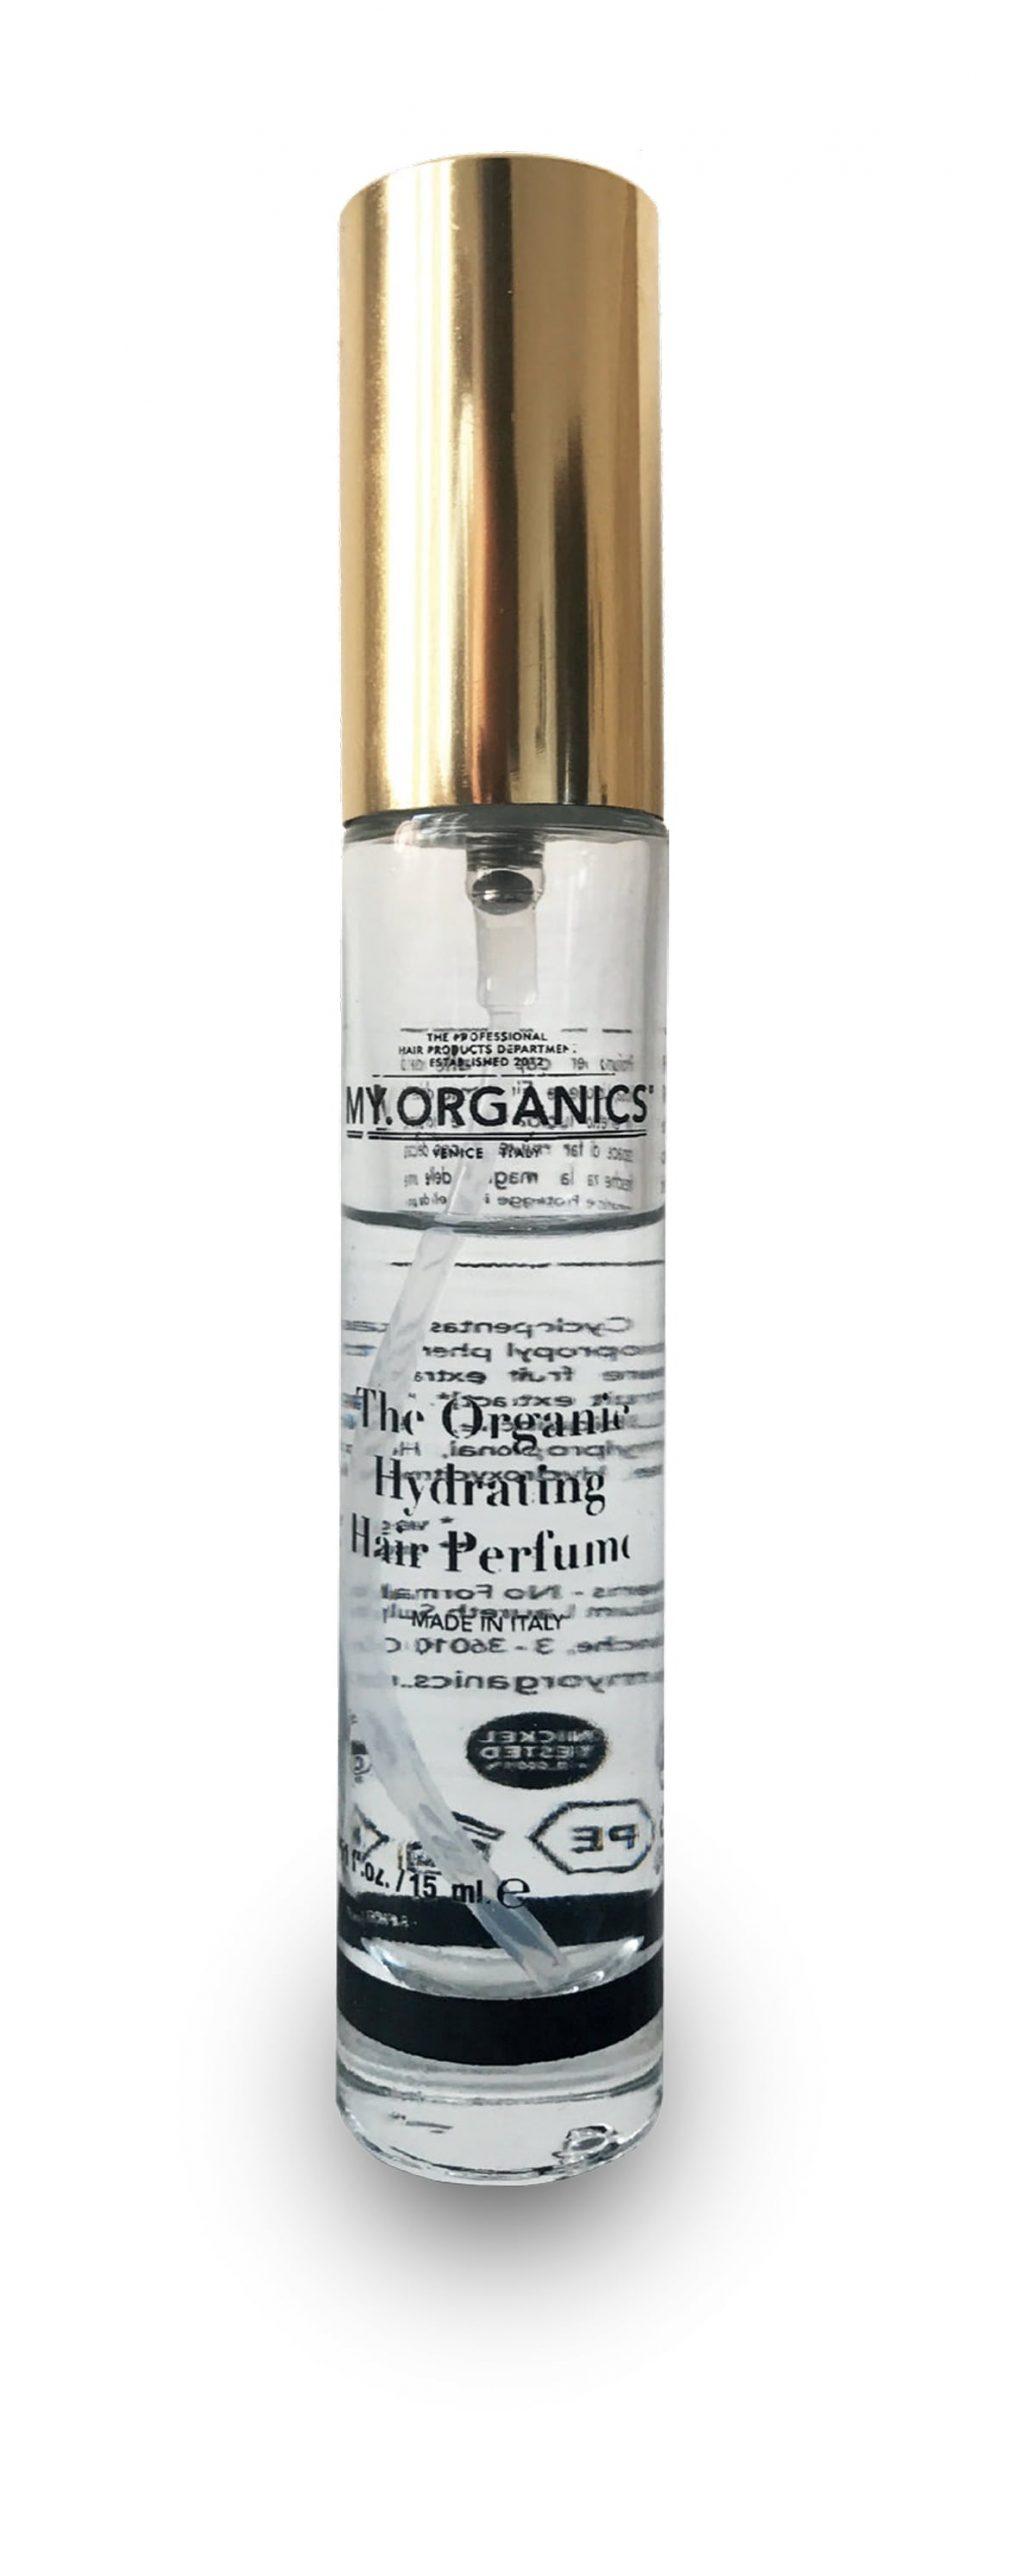 Hydrating Hair parfume MY.ORGANICS